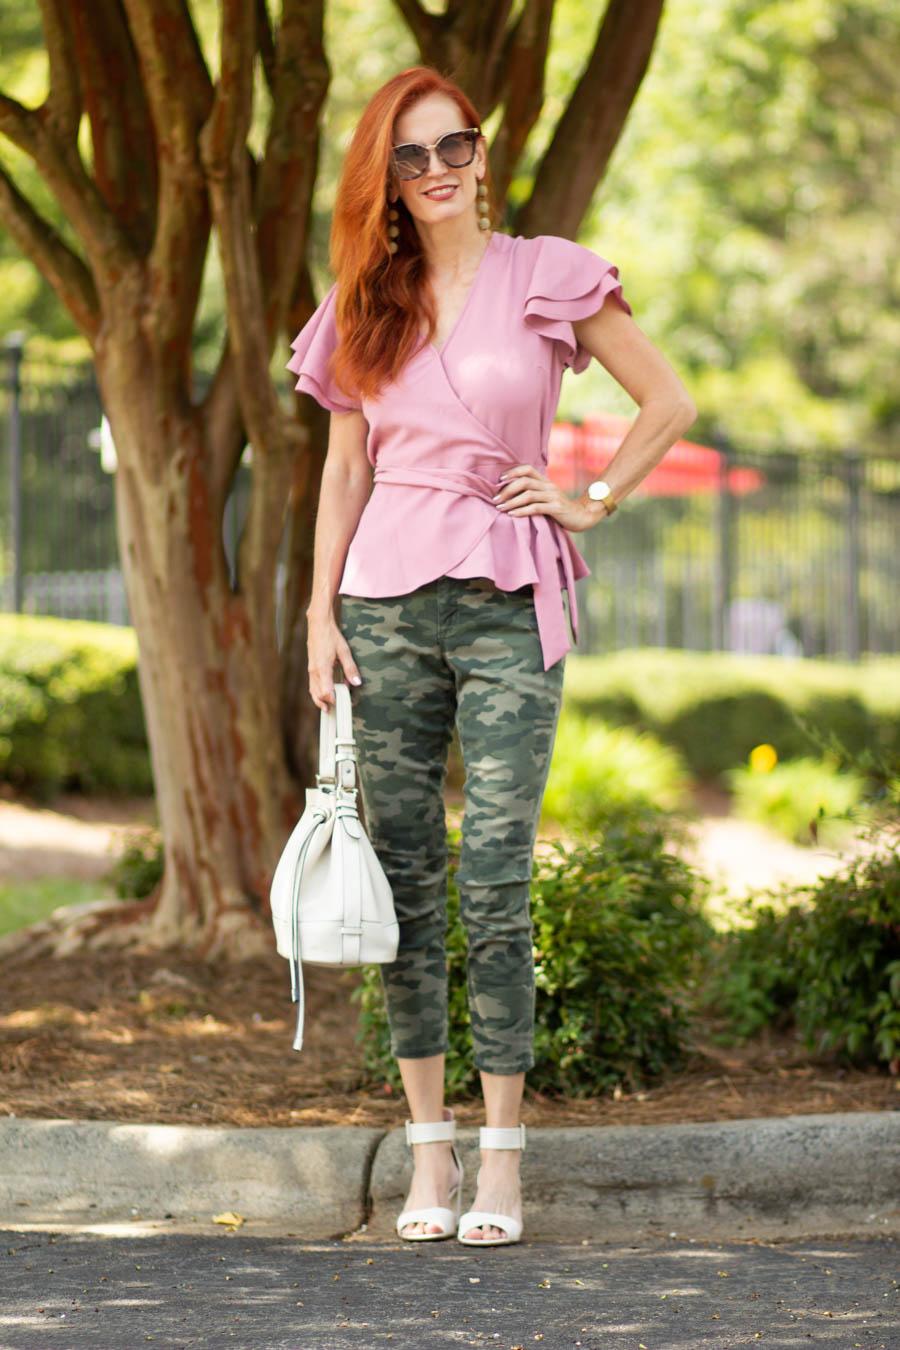 Women's camo jeans